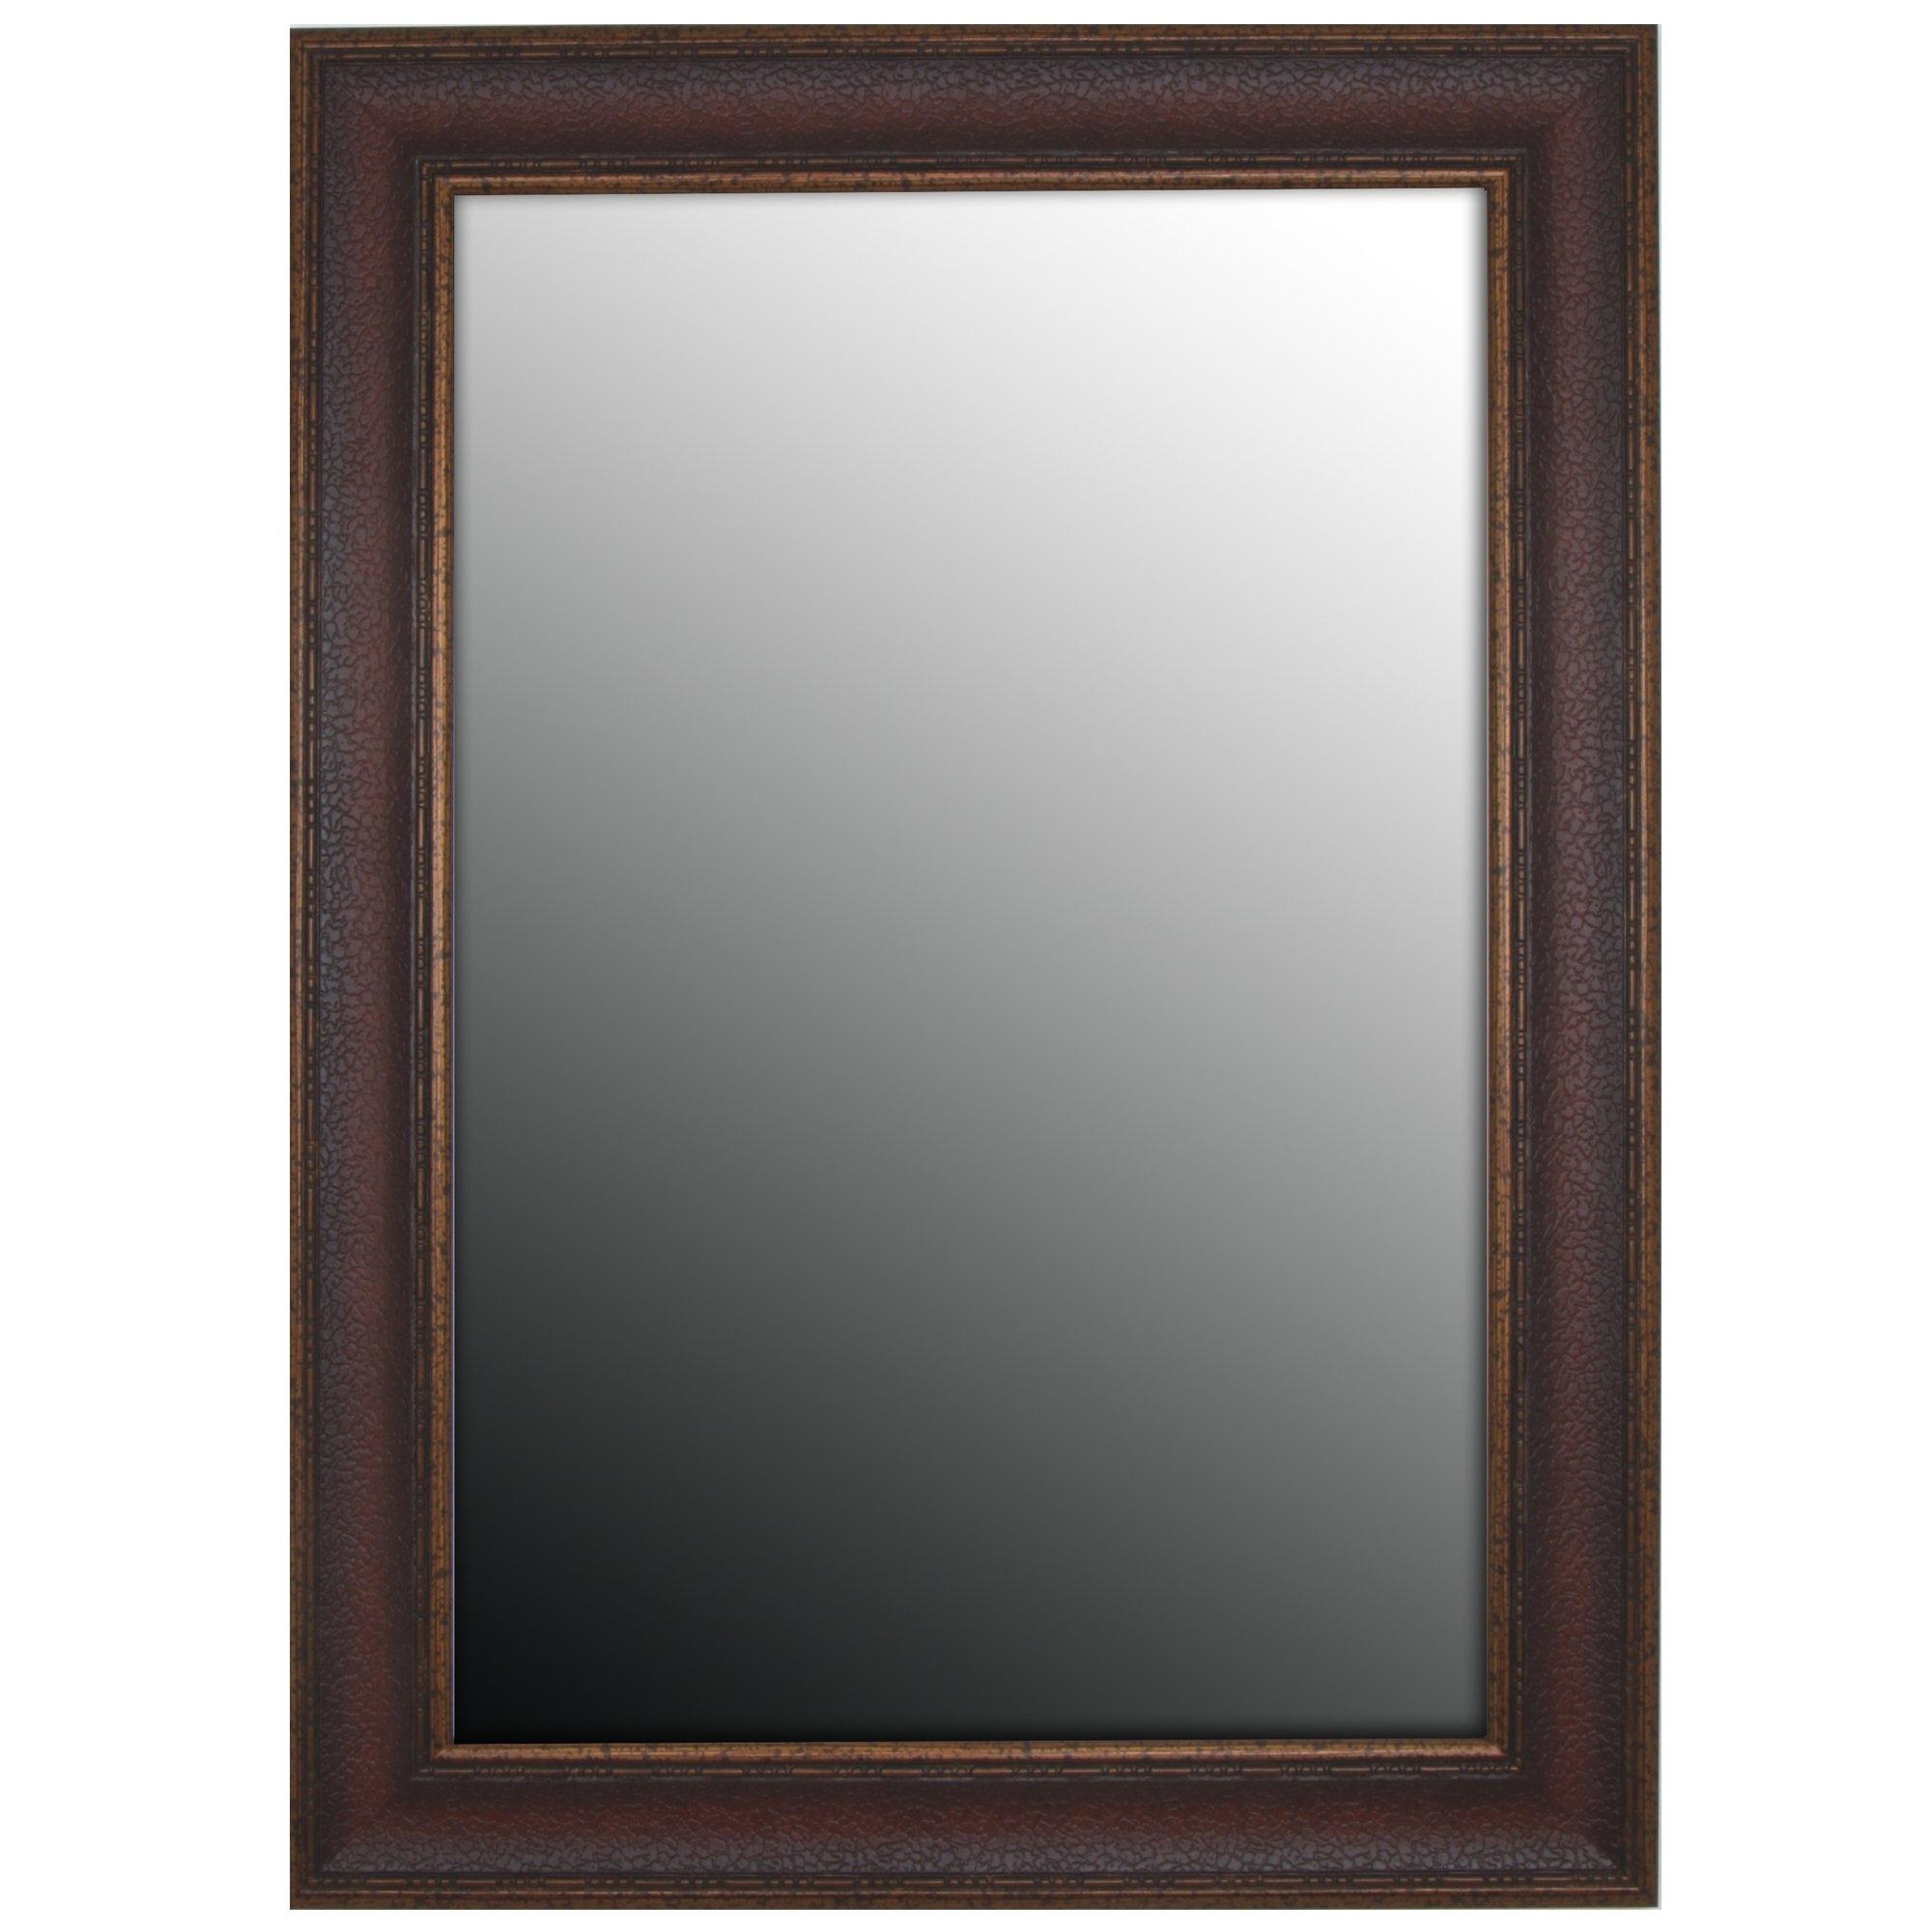 Second Look Mirrors Copper Embossed Bronze Wall Mirror Reviews For Bronze Wall Mirrors (View 6 of 15)